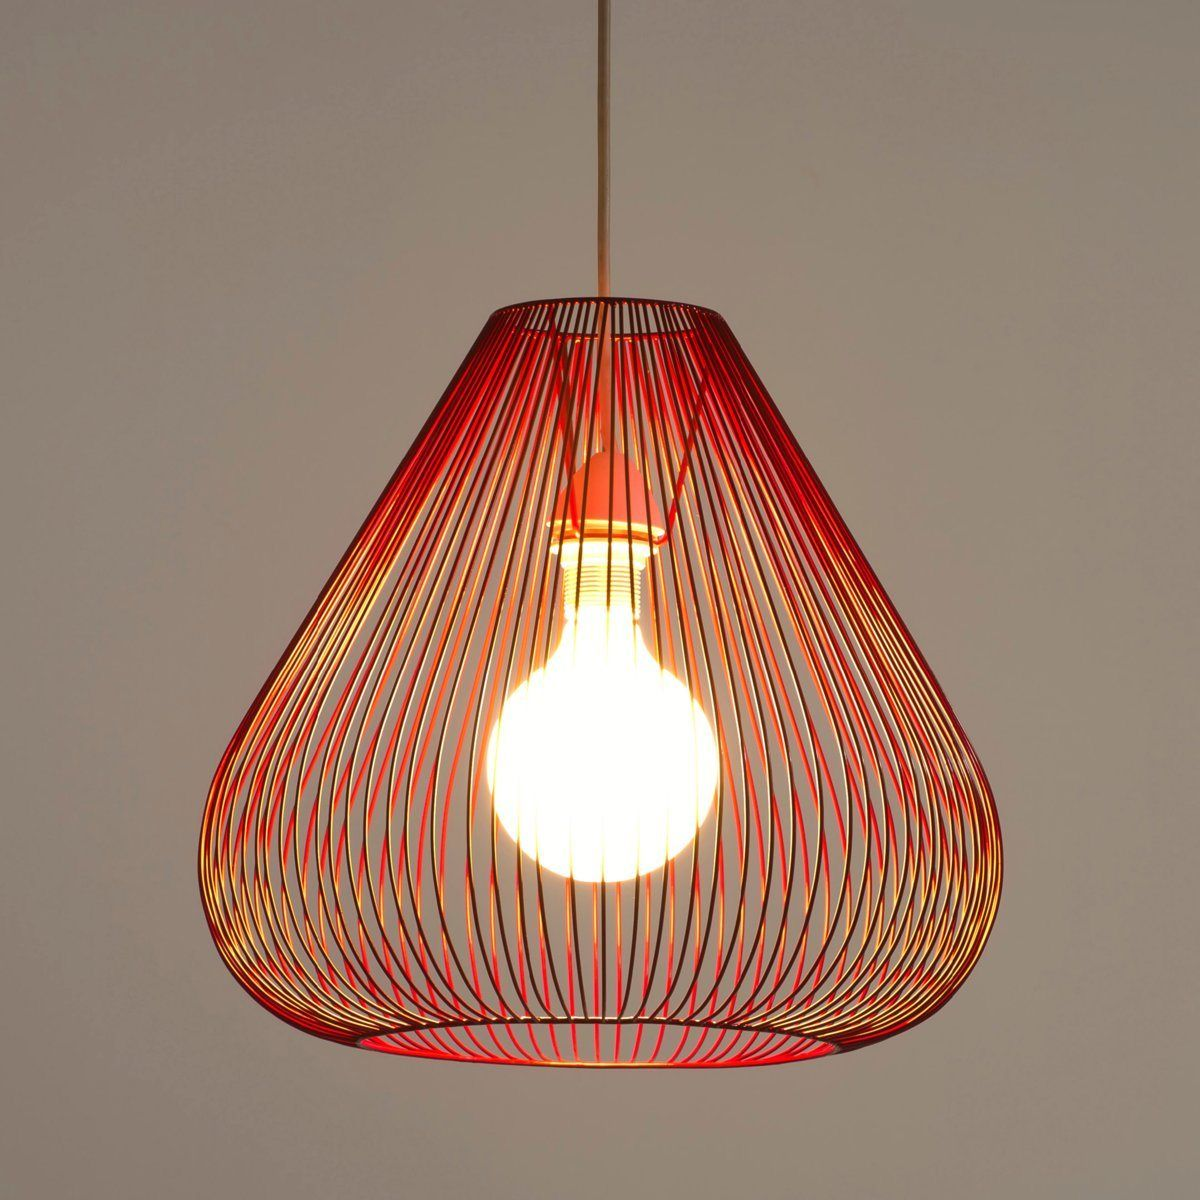 suspension filaire non lectrifi e autre lamp pinterest woods and lights. Black Bedroom Furniture Sets. Home Design Ideas